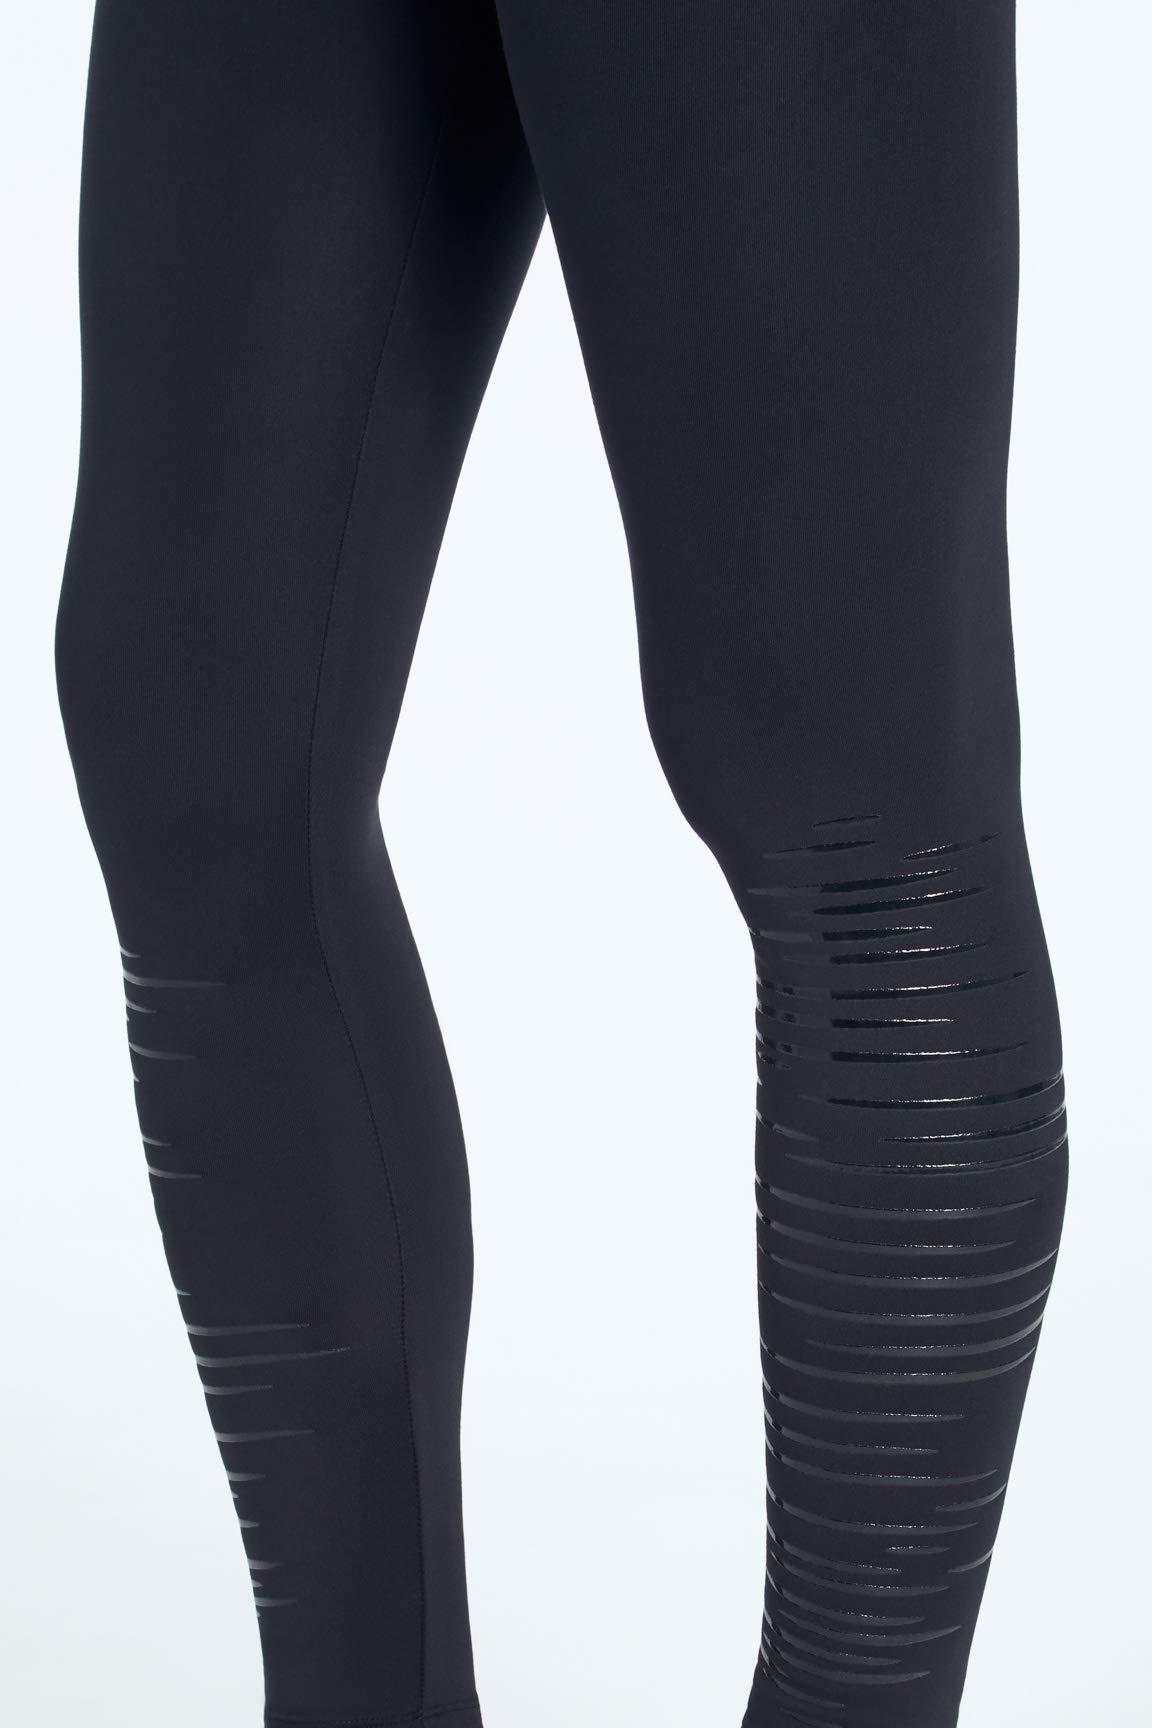 Marika High Rise Performance Frequency Legging, Black, Small